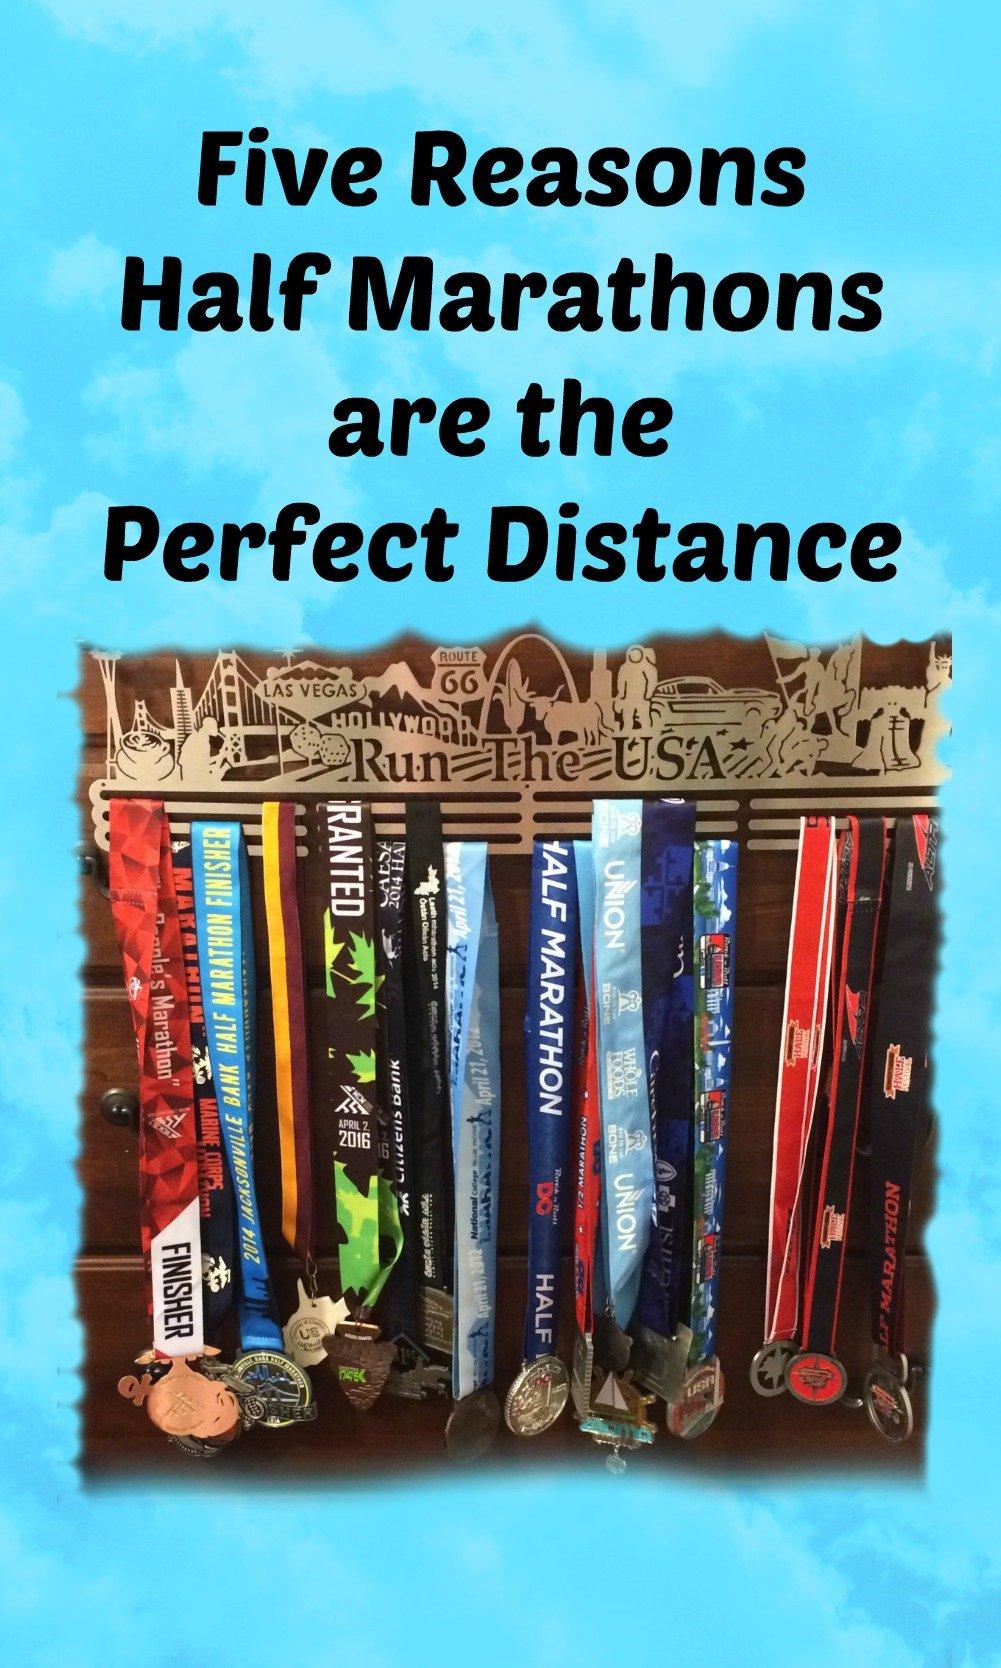 Half marathons are the perfect distance